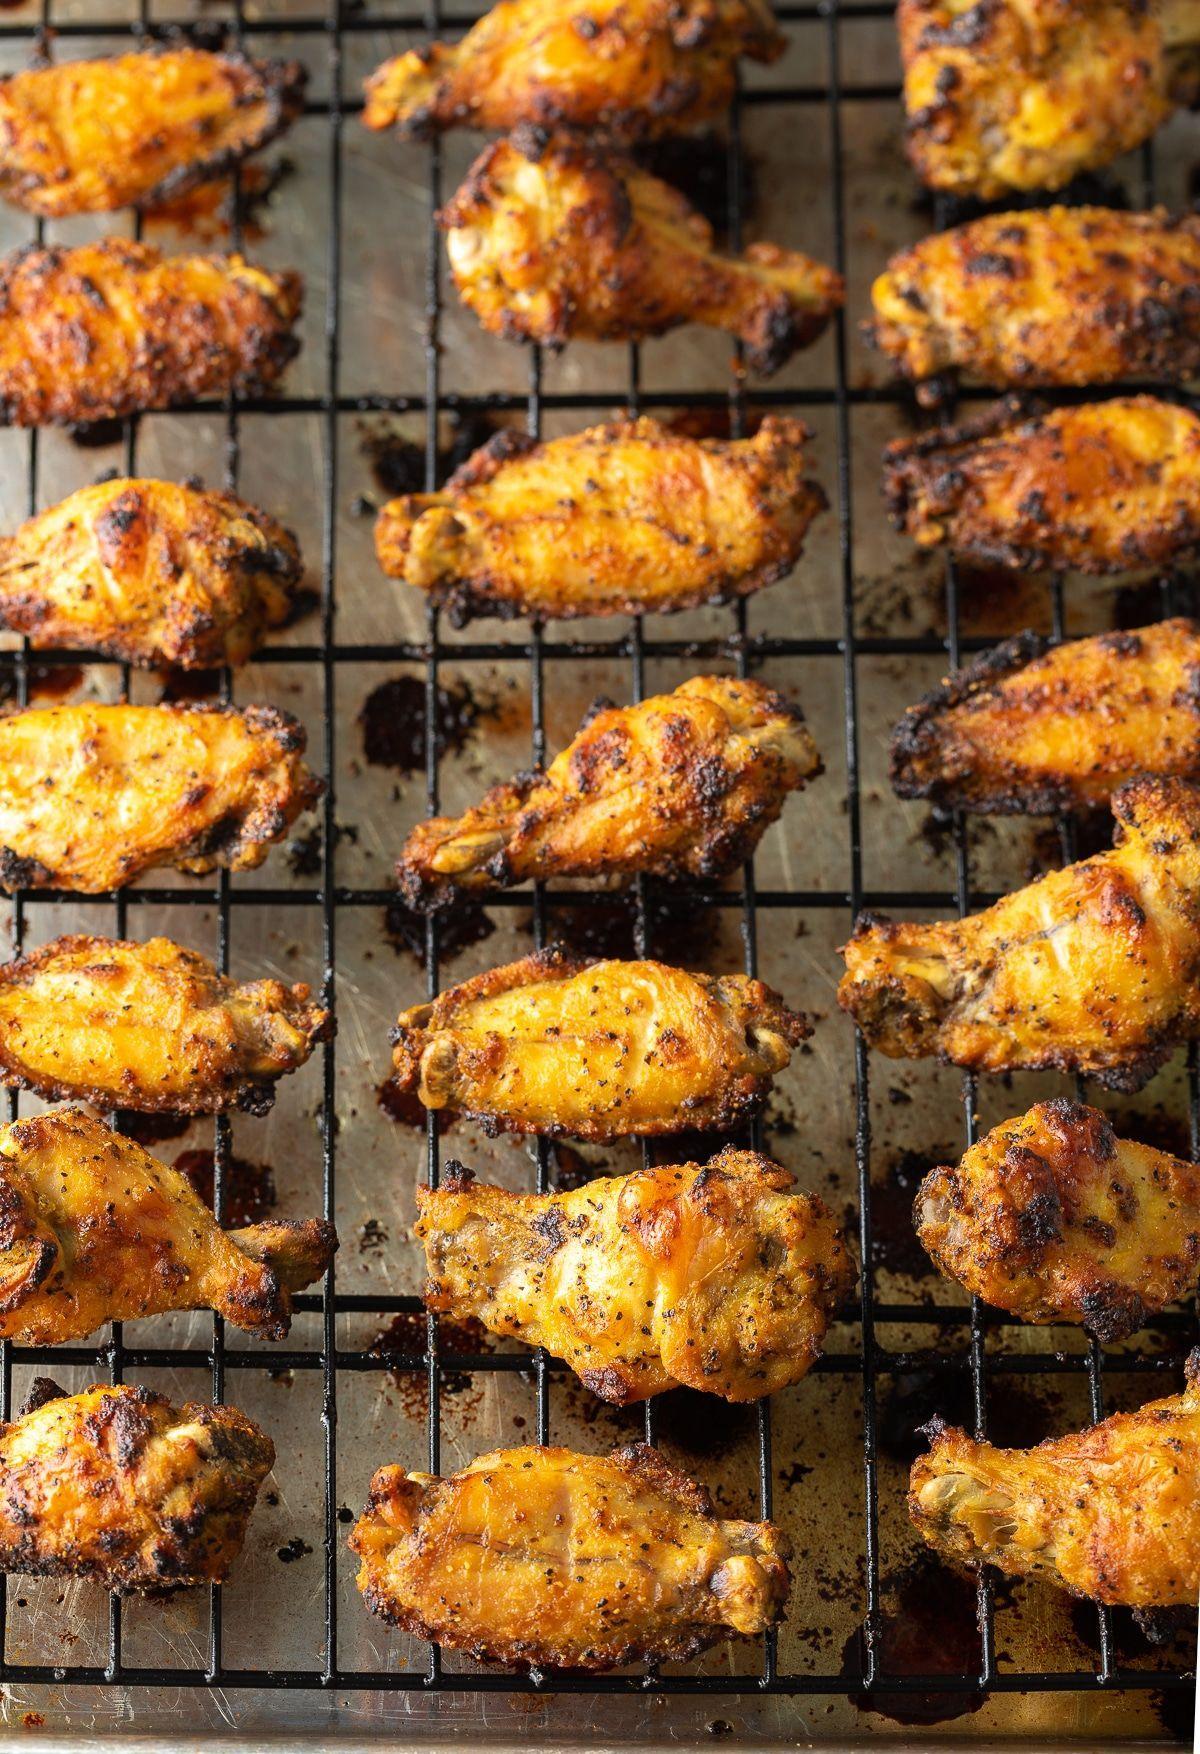 Best lemon pepper chicken wings recipe aspicyperspective